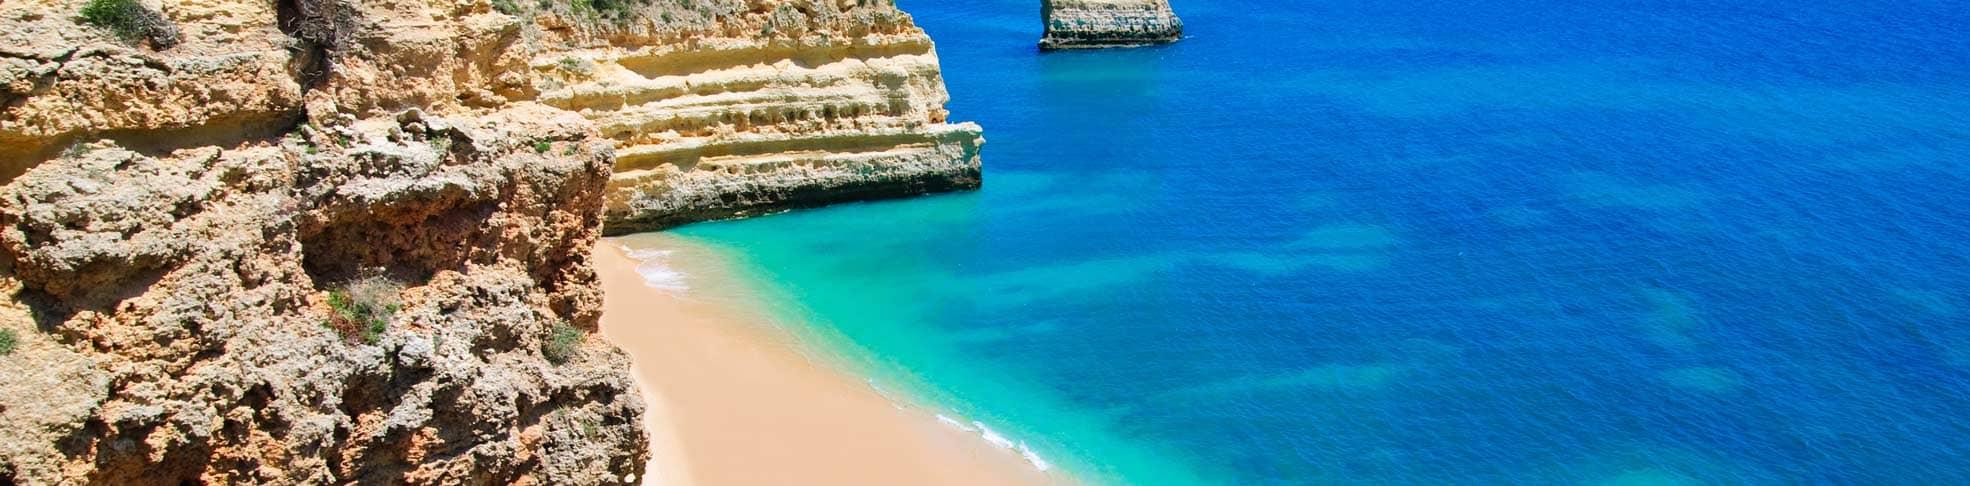 Cheap Cyprus Holidays Amp Deals 2019 2020